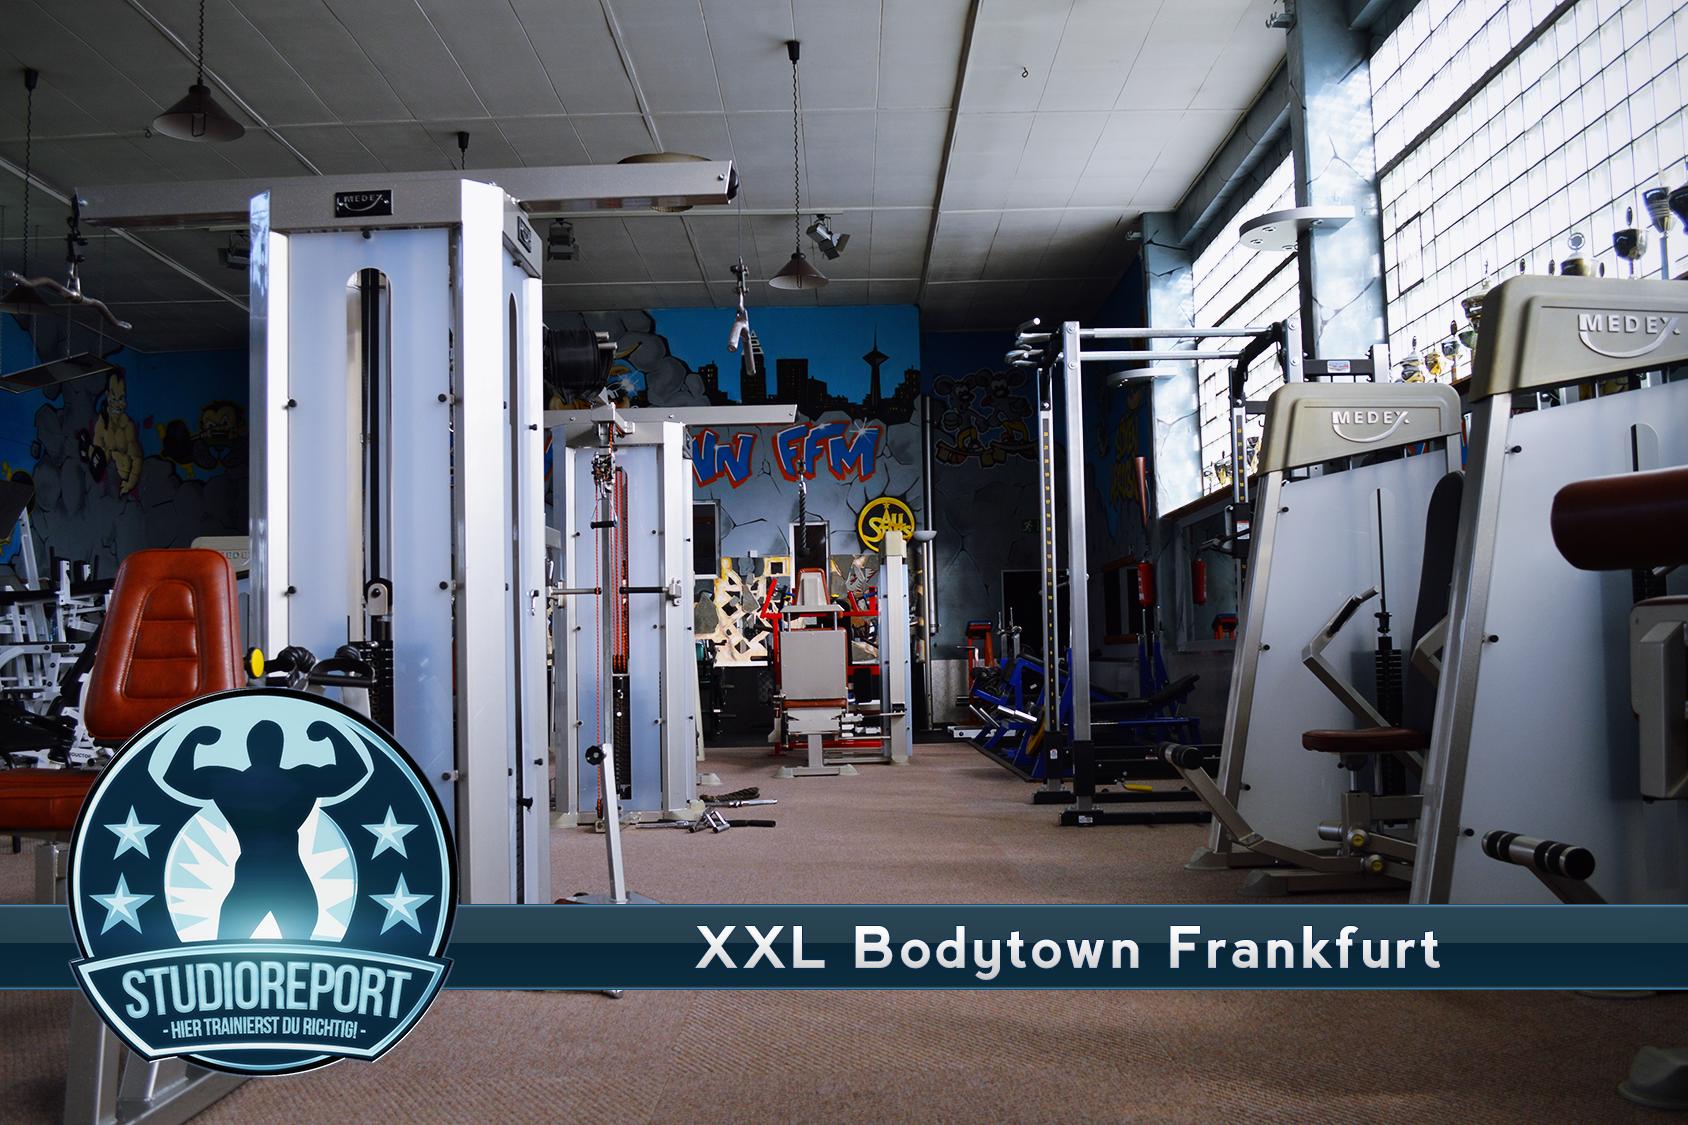 studioreport hier trainierst du richtig xxl bodytown frankfurt fitness magazin. Black Bedroom Furniture Sets. Home Design Ideas